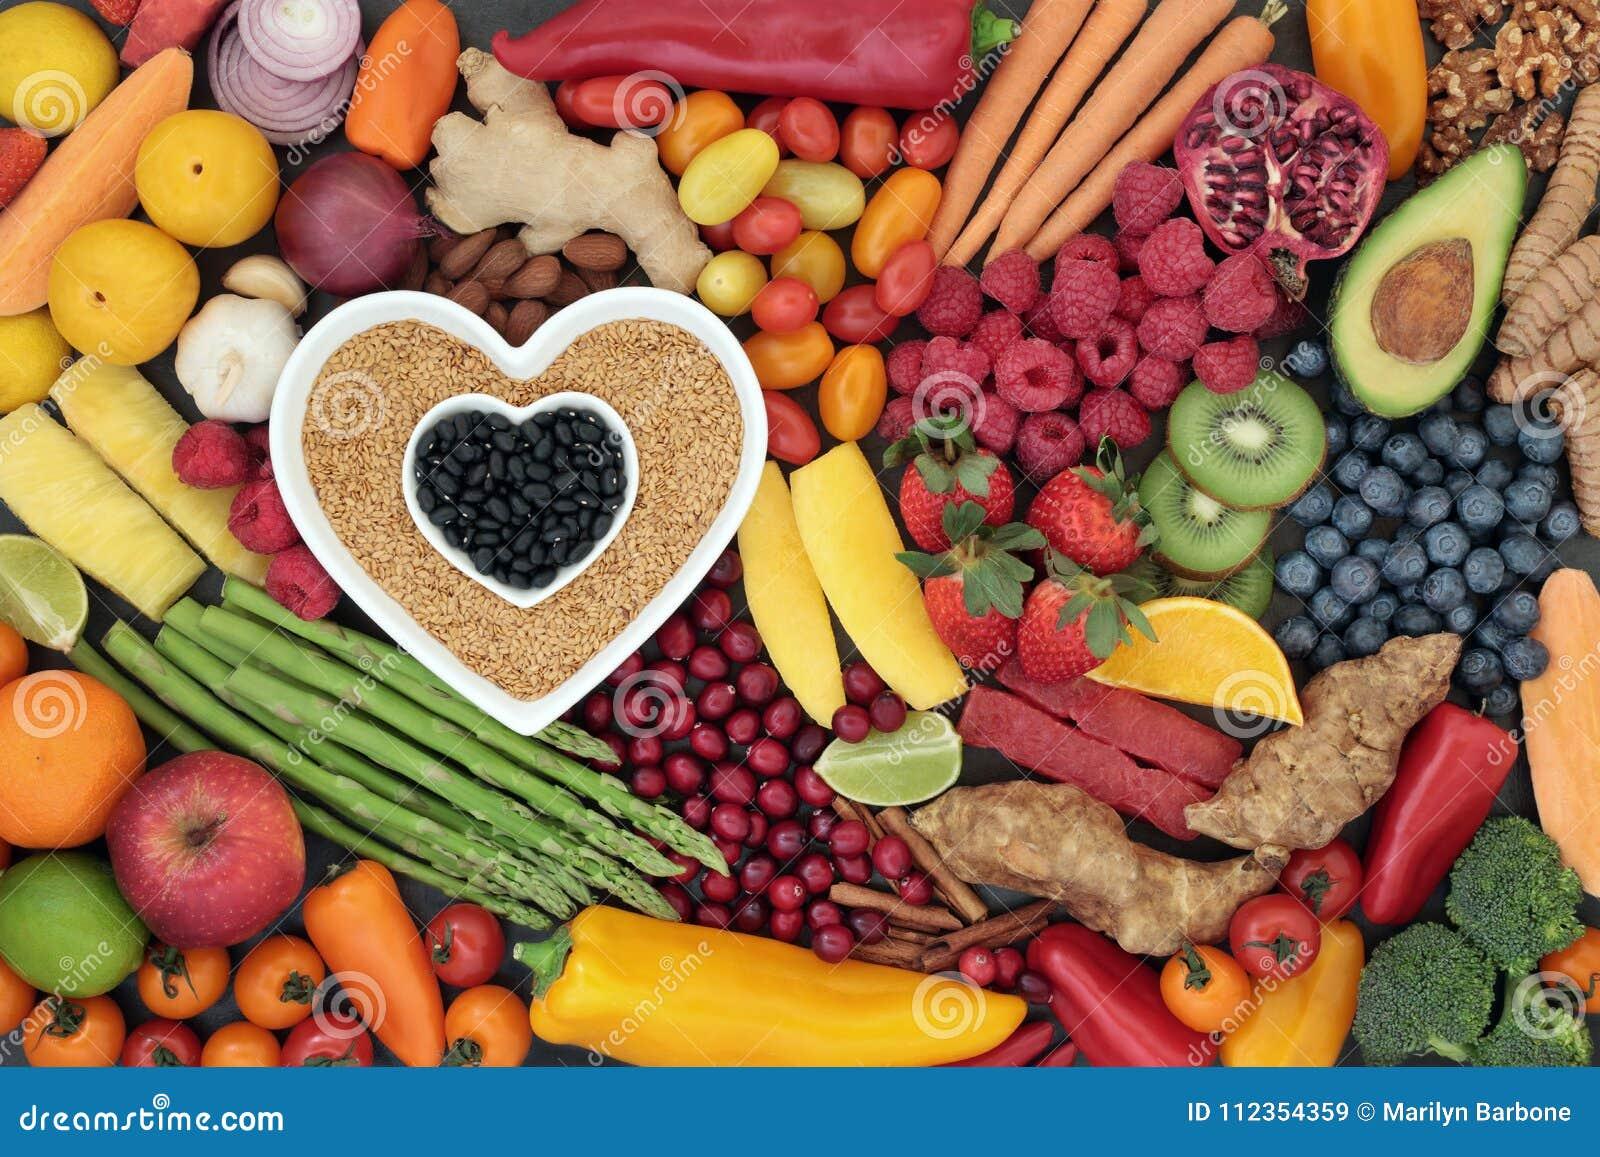 Healthy Heart Super Food